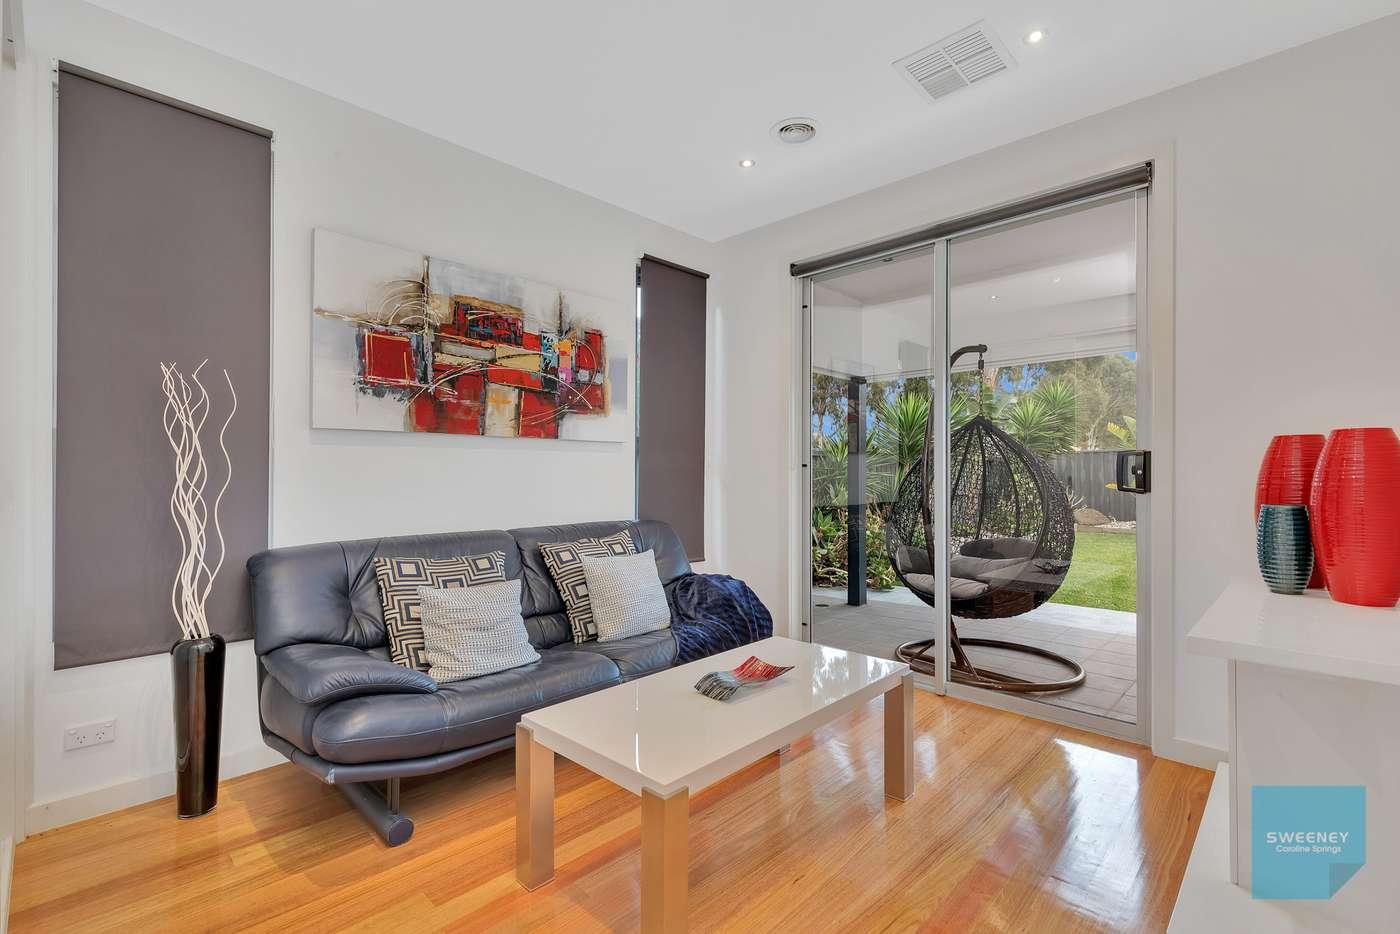 Sixth view of Homely house listing, 12 Burtt Avenue, Caroline Springs VIC 3023